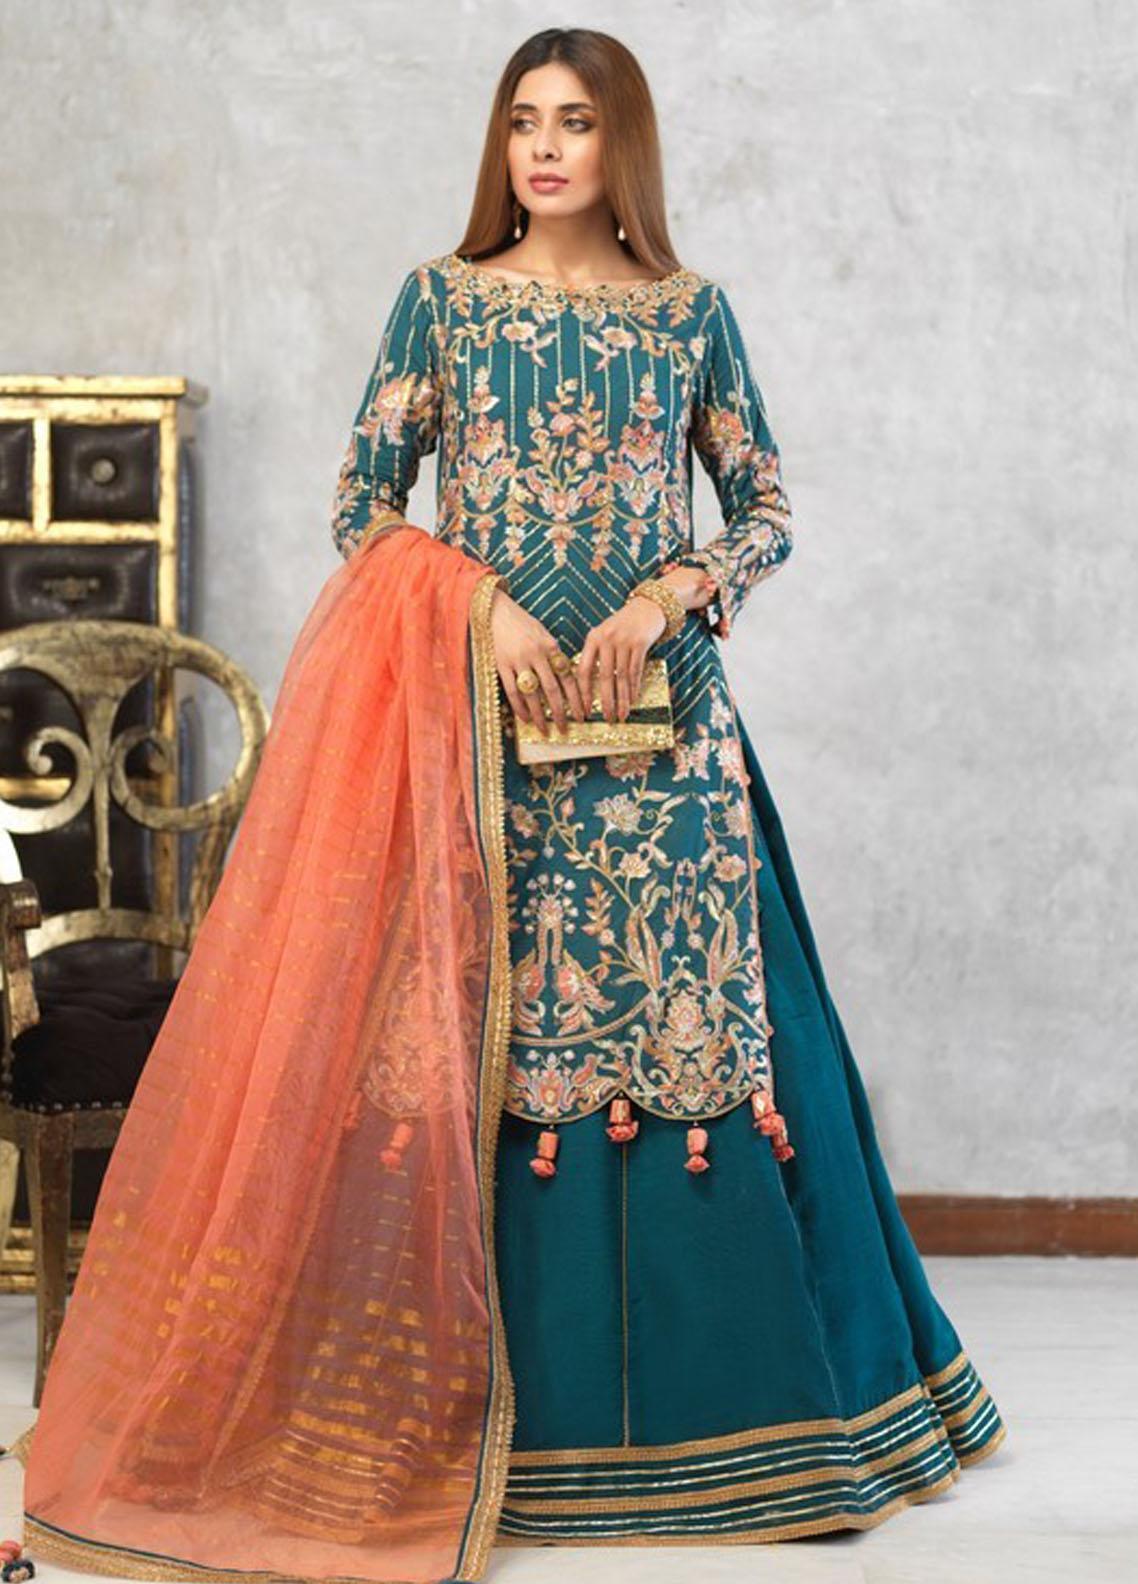 Asim Jofa Embroidered Cotton Net Suit Unstitched 3 Piece 2021 18 – Festive Collection